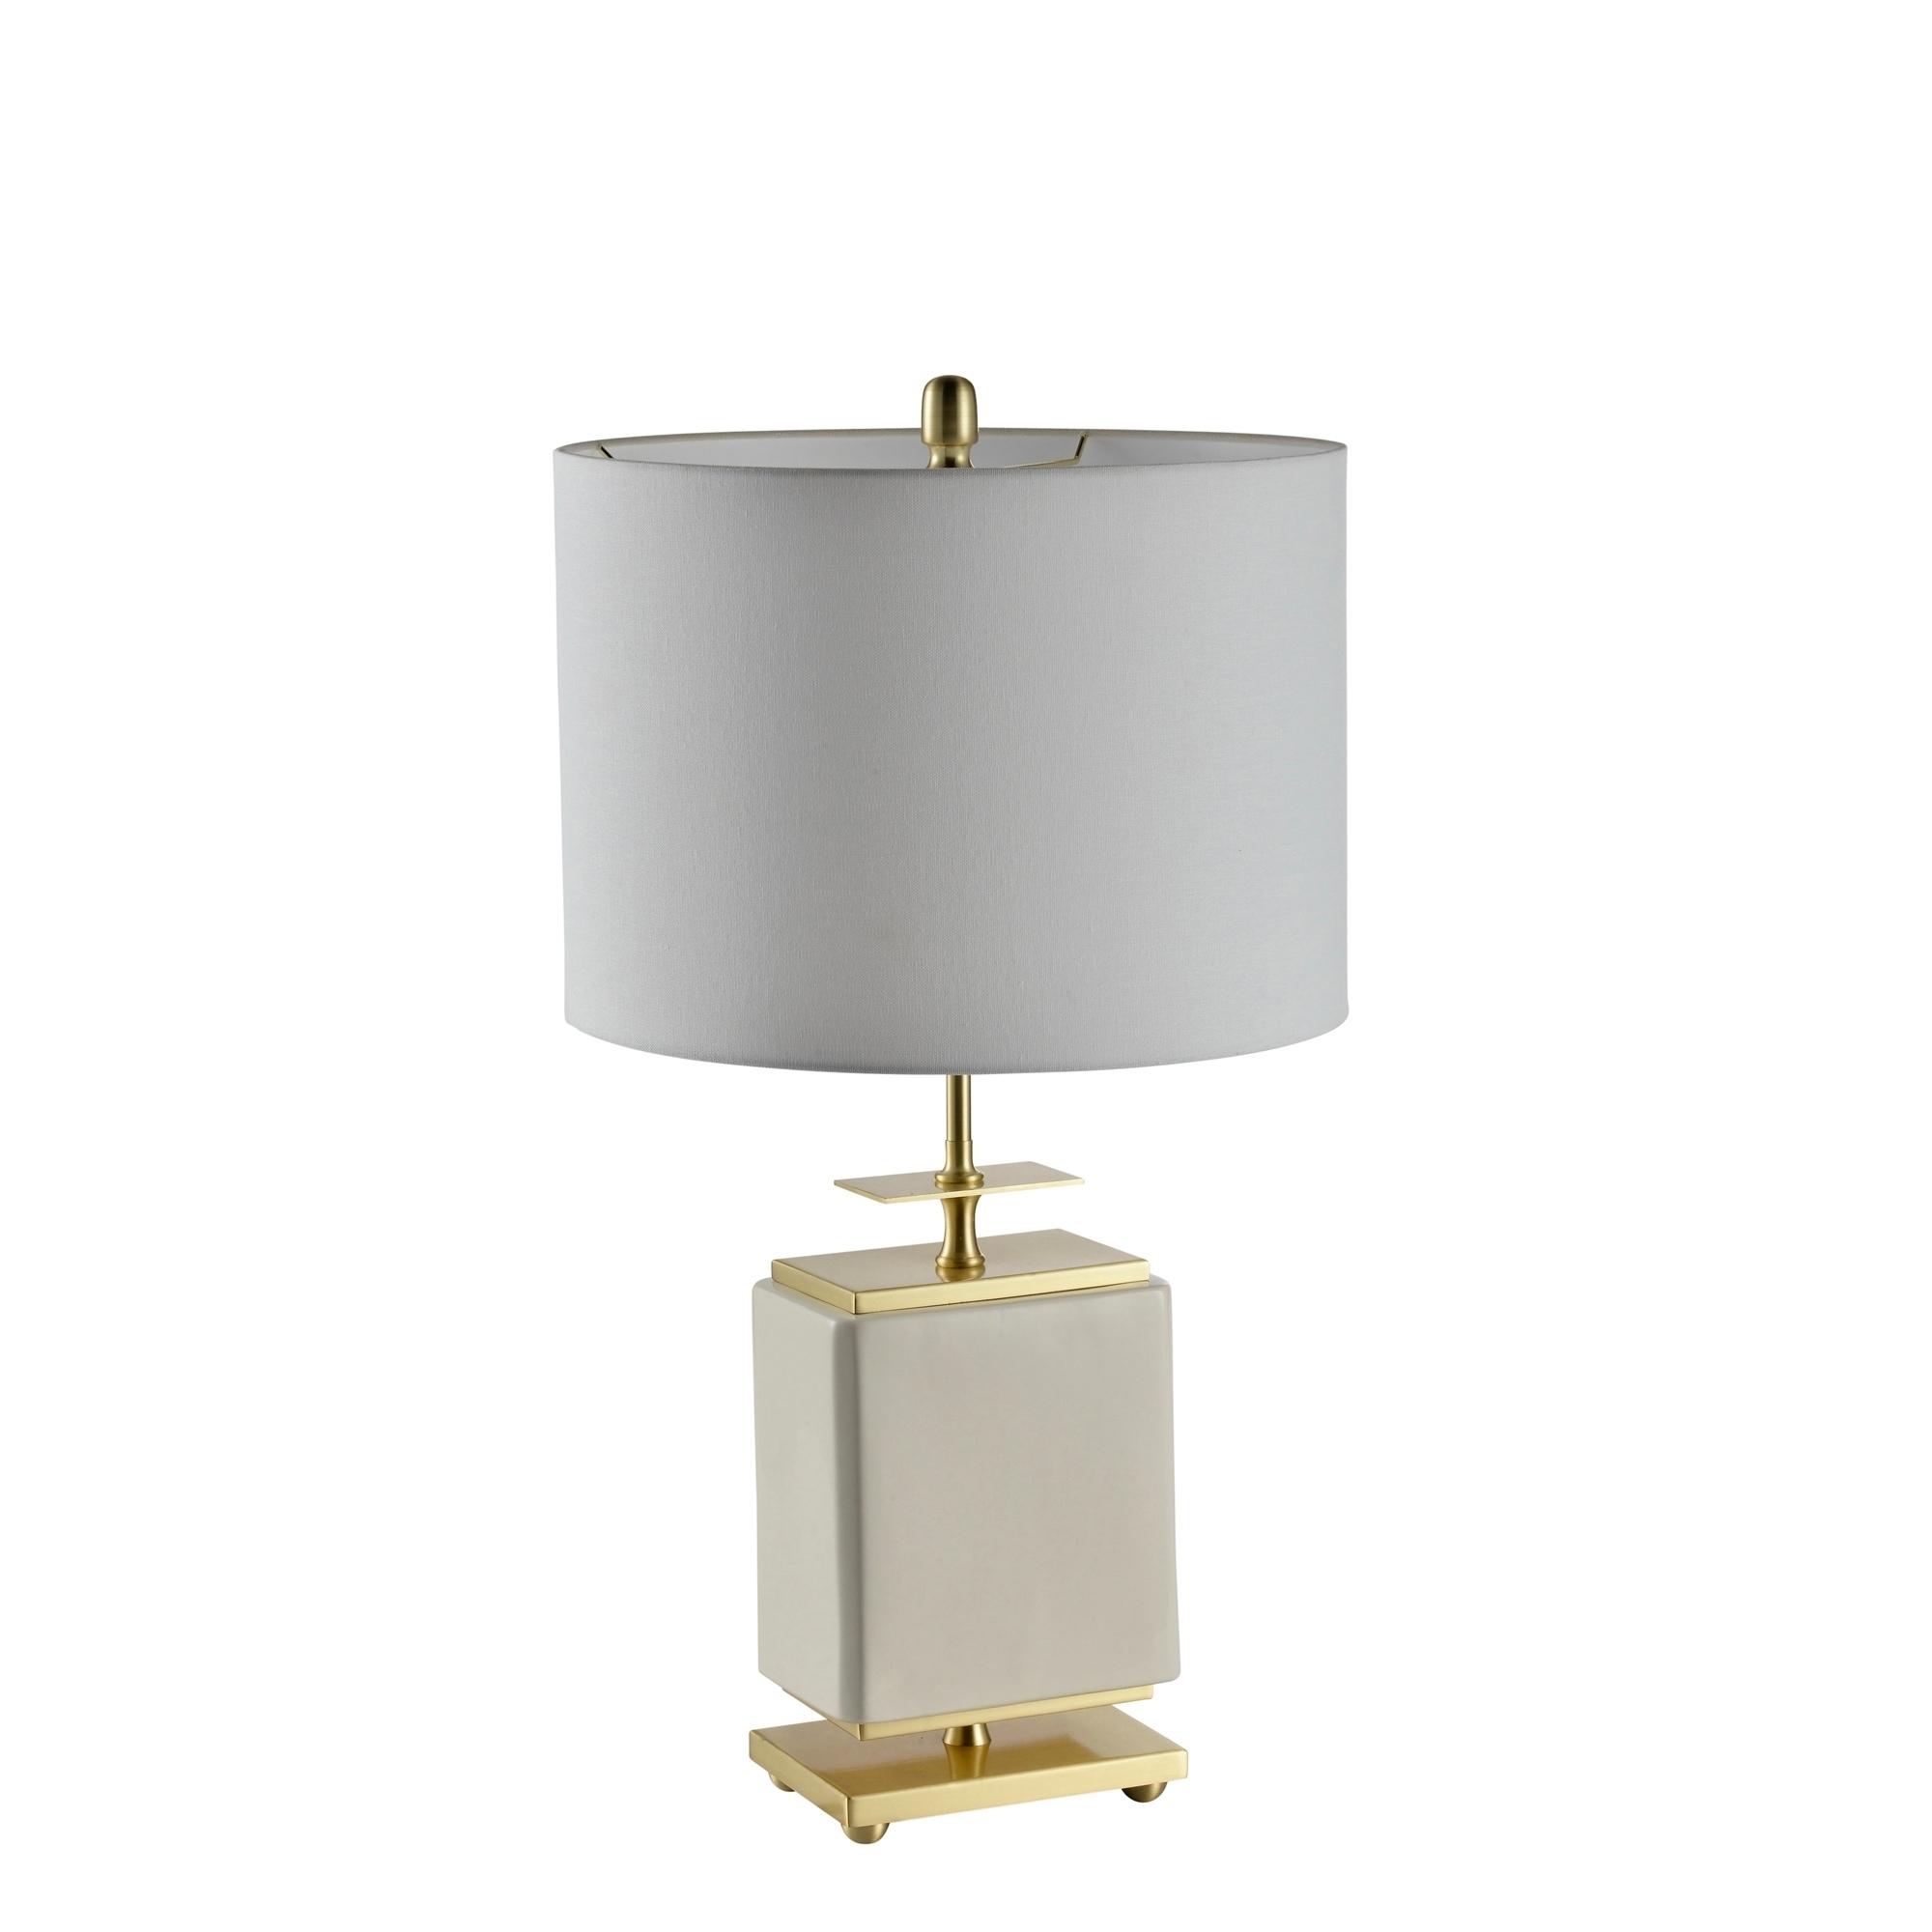 Ceramic Square Table Lamp White Gold 28 Overstock 25623637